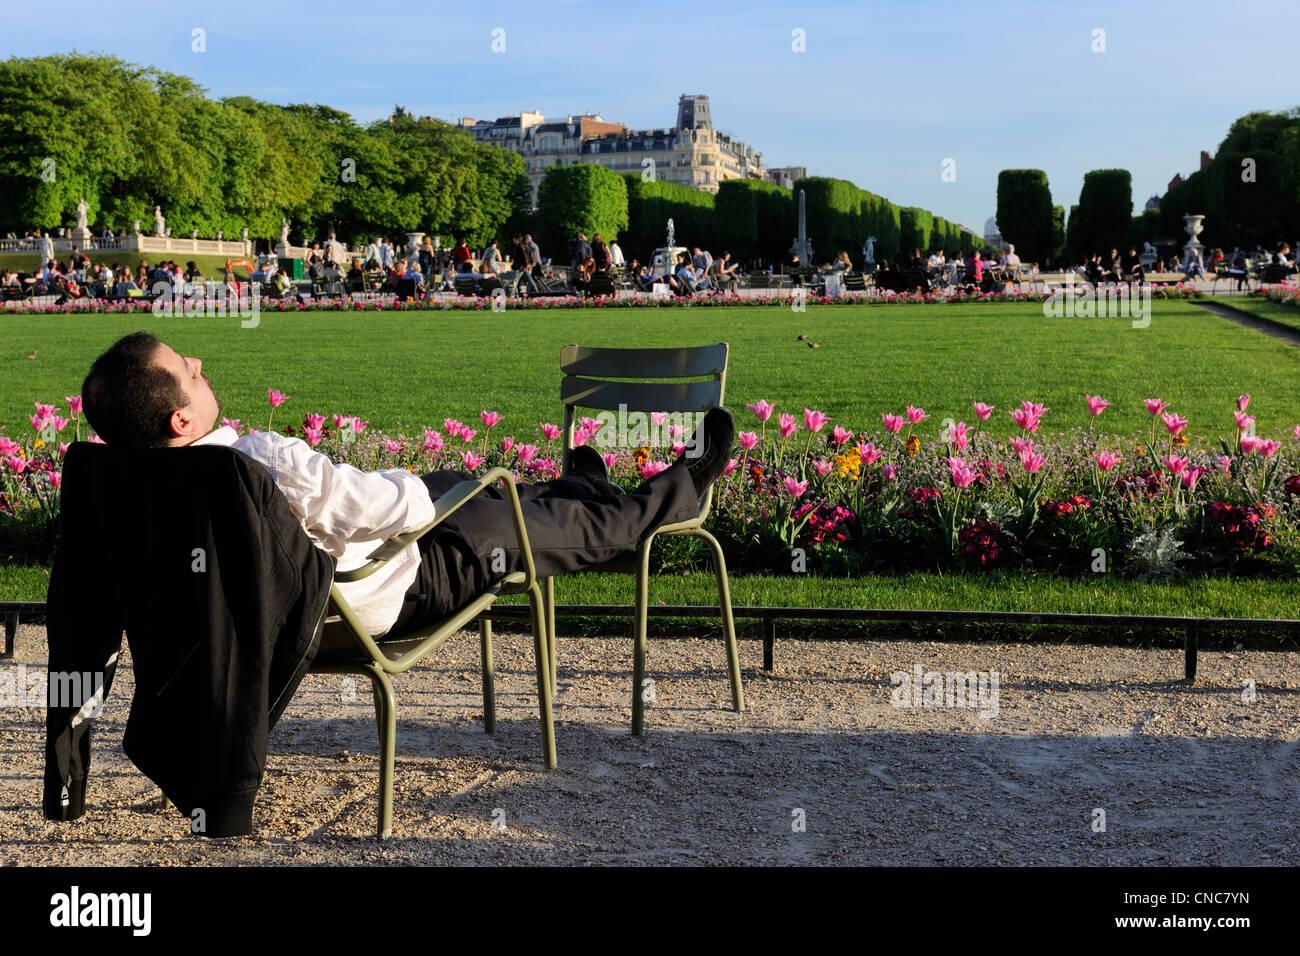 France, Paris, Jardin du Luxembourg, nap on a chair - Stock Image